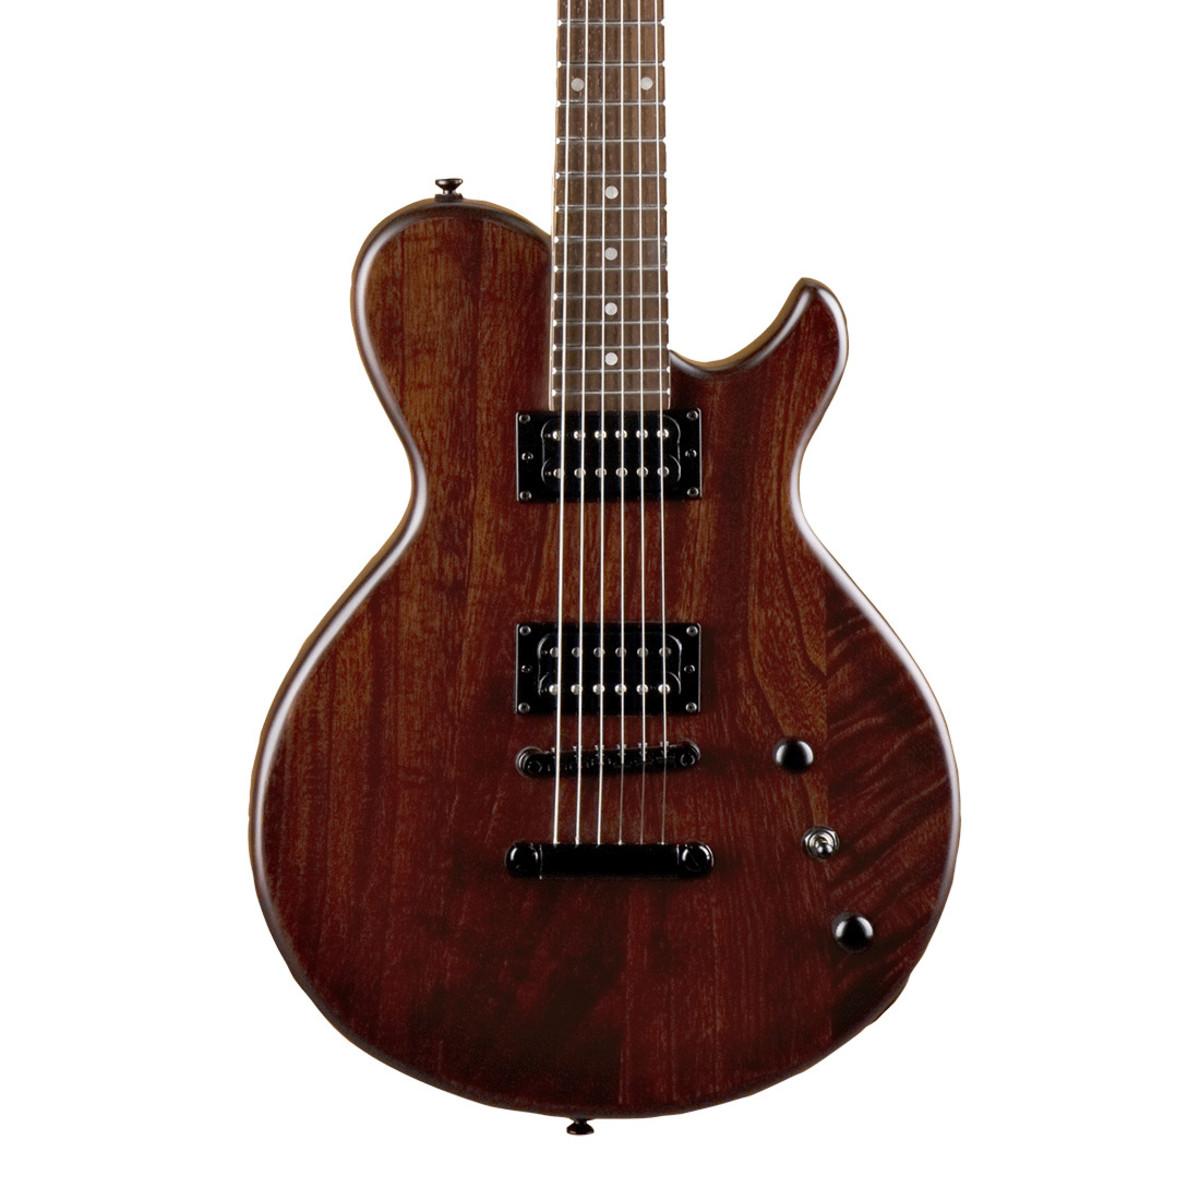 dean evo xm electric guitar satin natural at. Black Bedroom Furniture Sets. Home Design Ideas